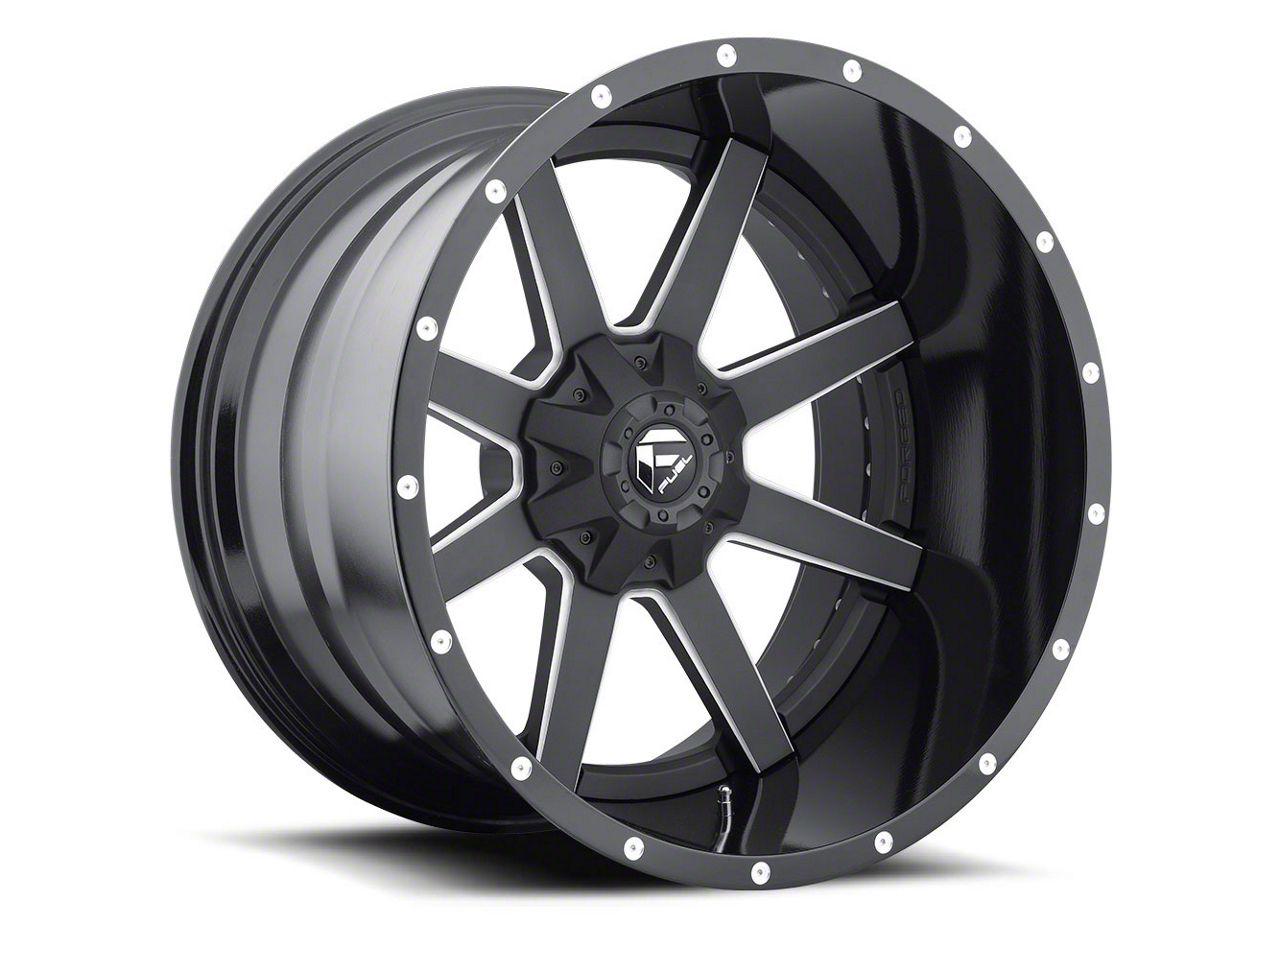 Fuel Wheels Maverick 2-Piece Black Milled 5-Lug Wheel - 20x12 (02-18 RAM 1500, Excluding Mega Cab)